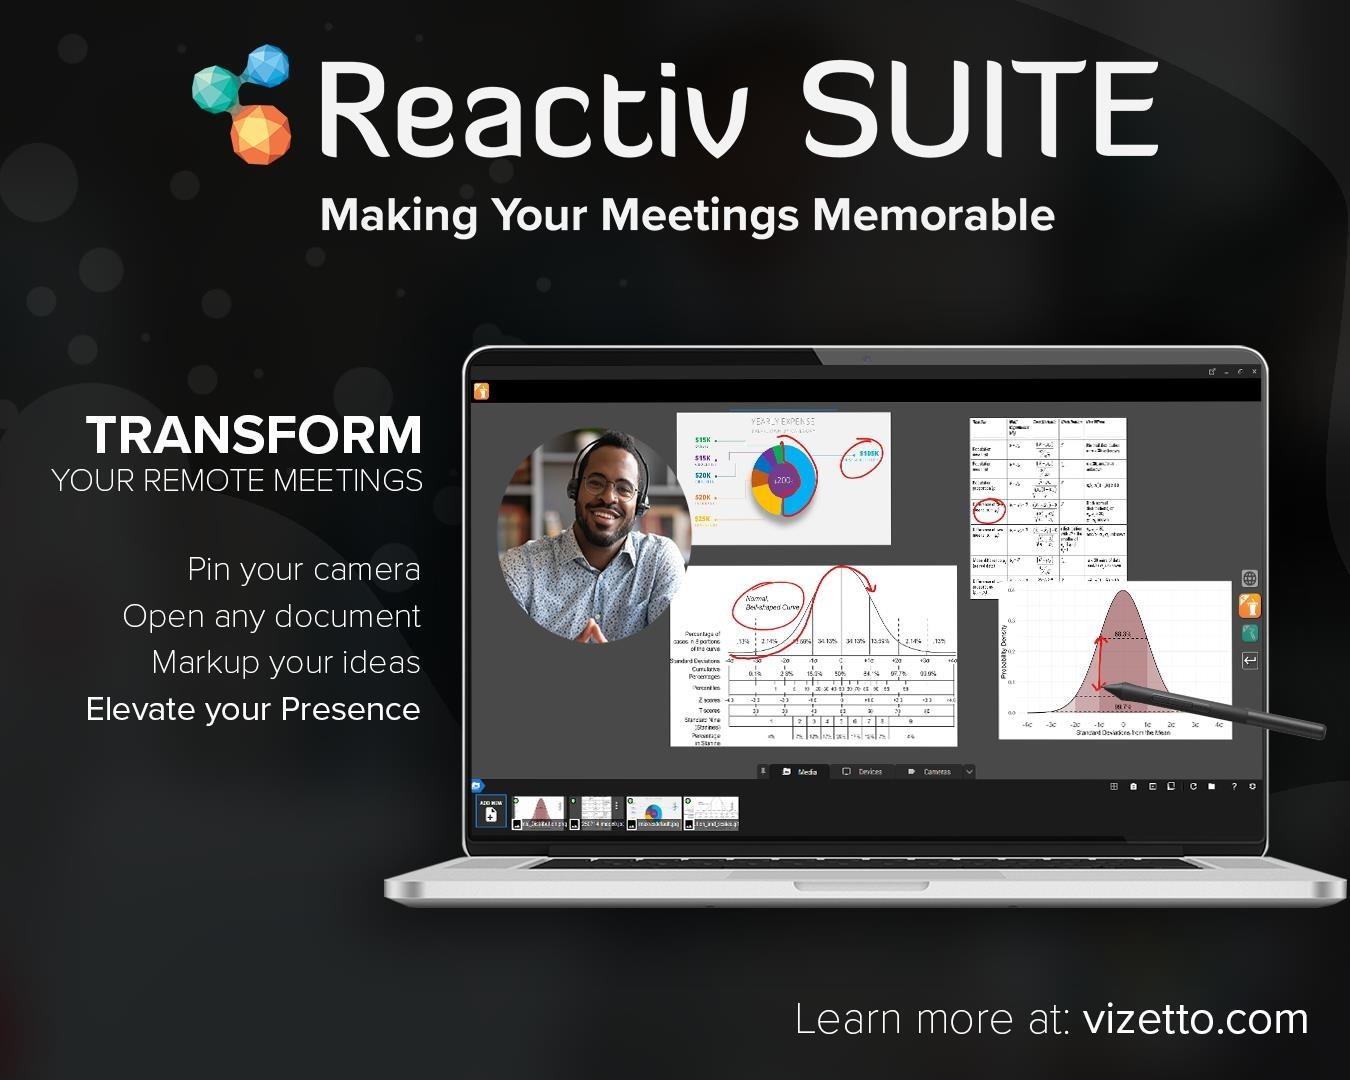 Zoom White Board V/S Reactiv Suite